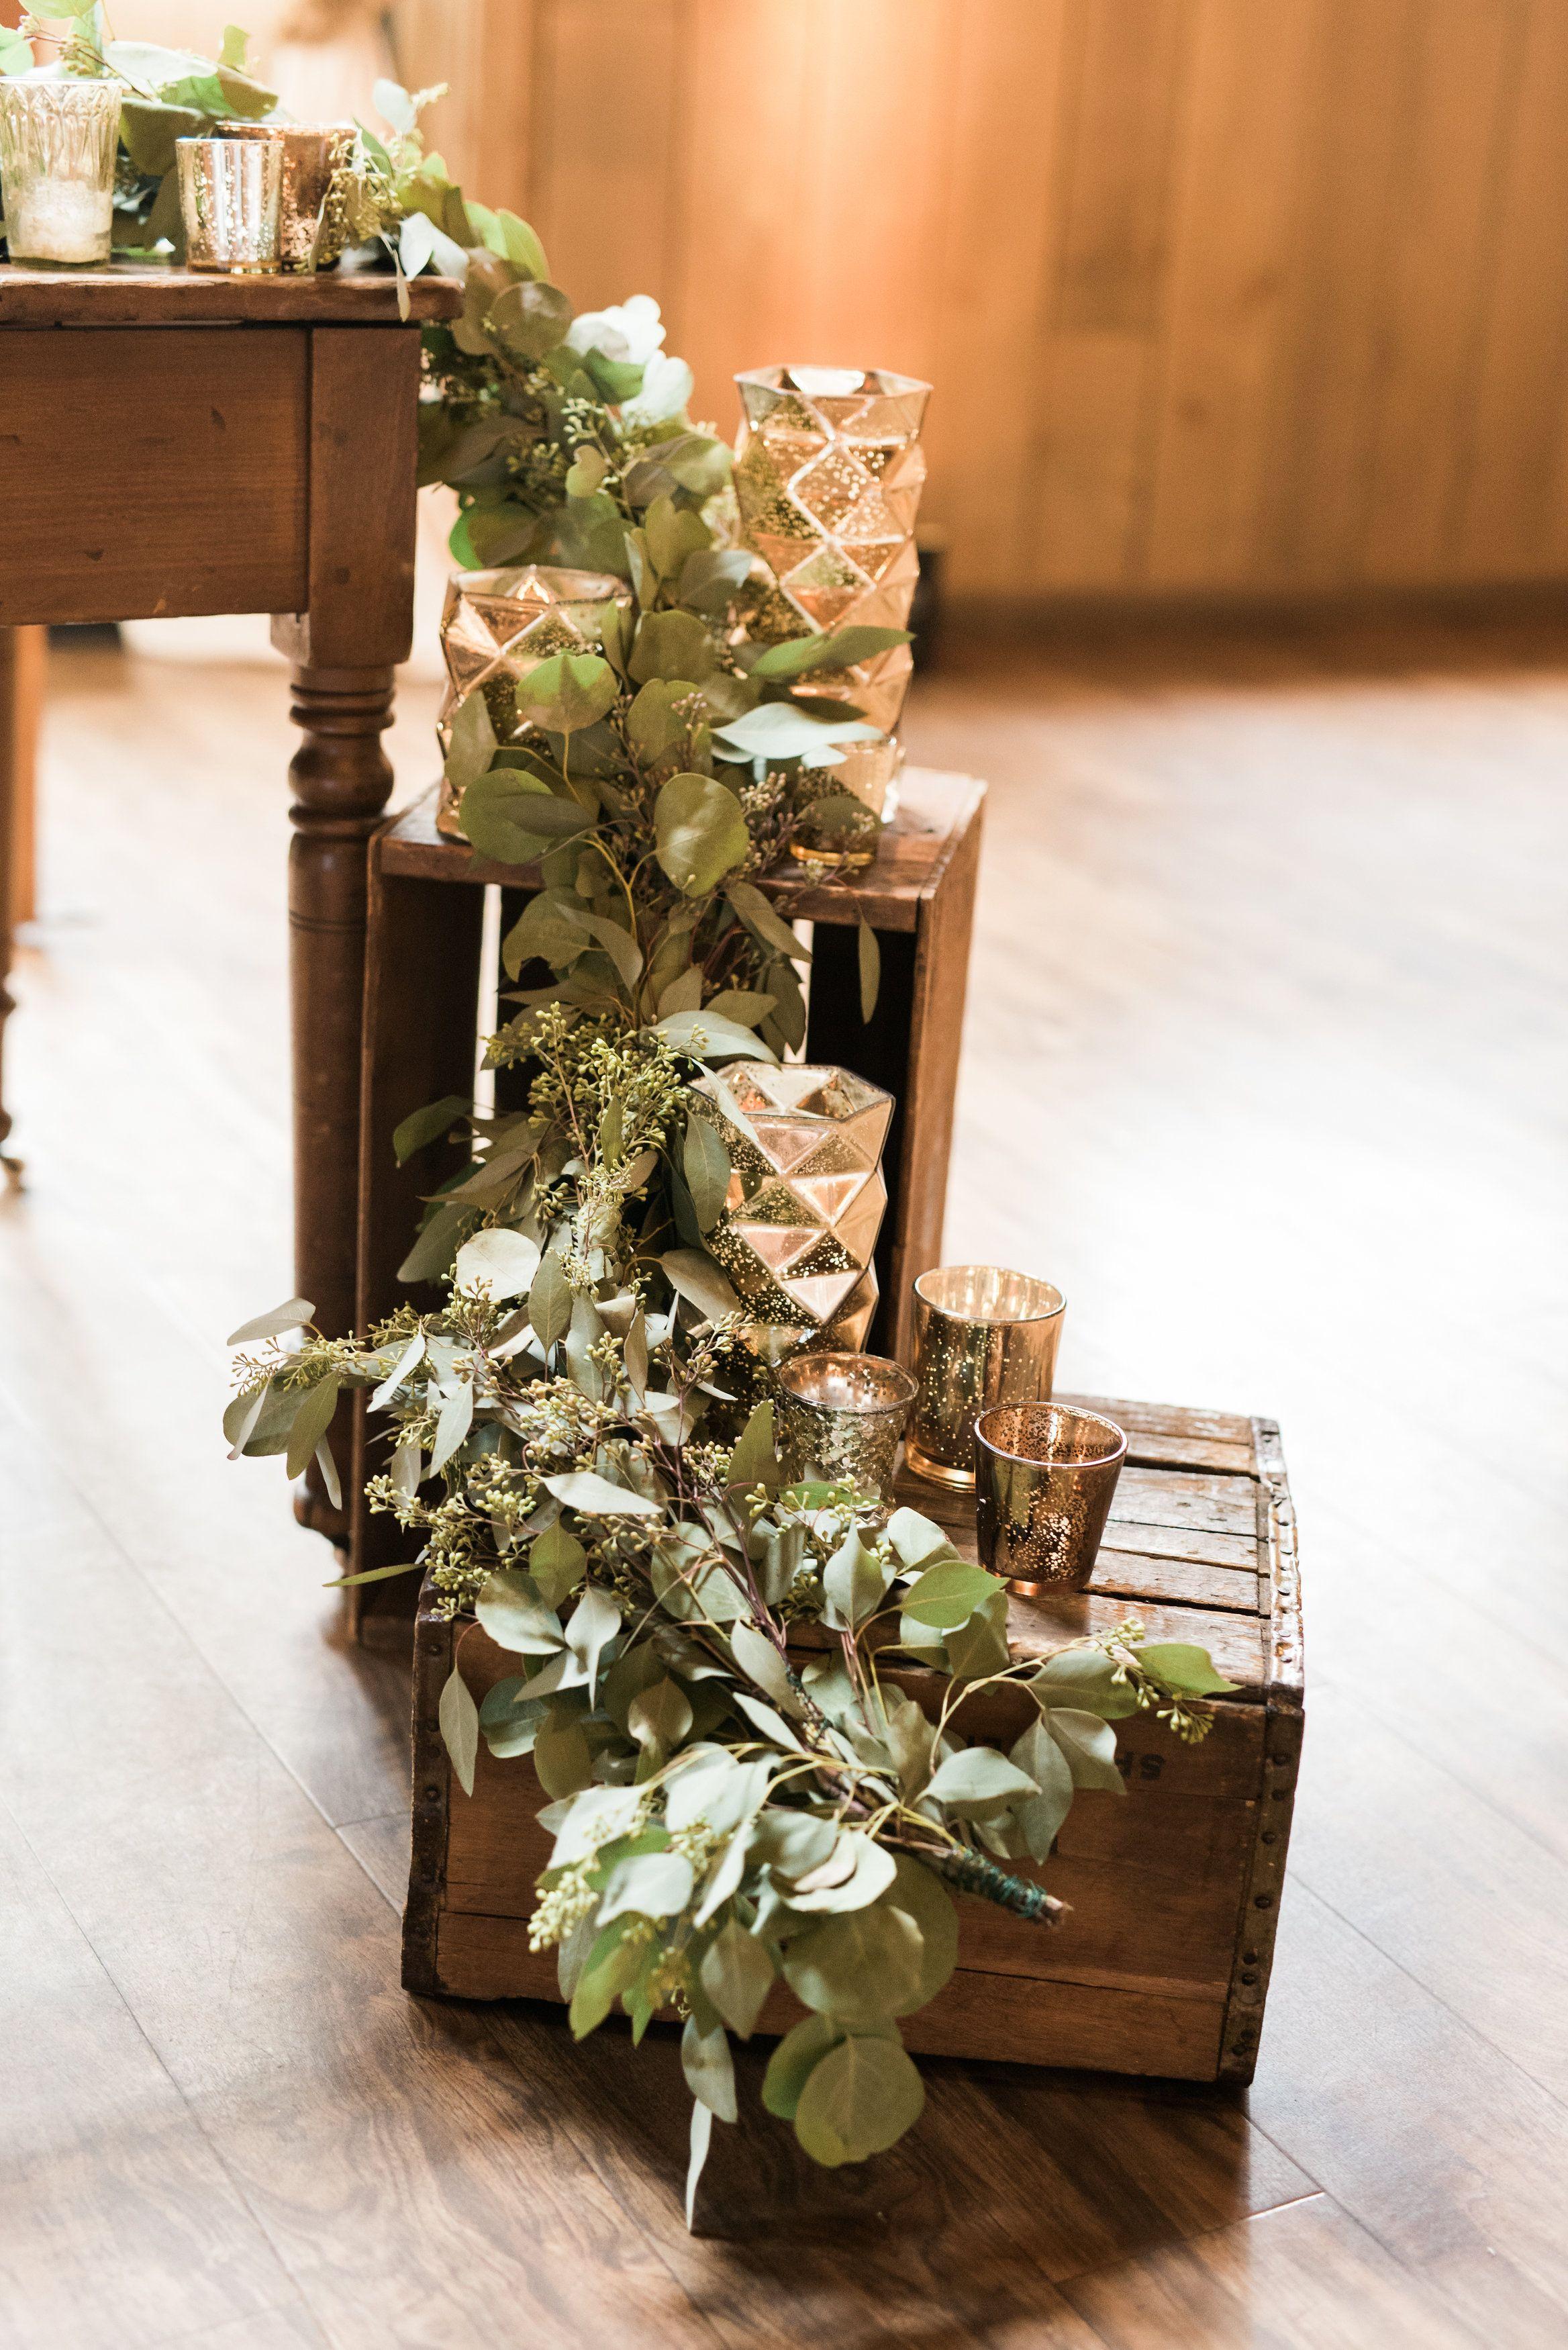 Wedding greenery - Wisconsin wedding barn | Wisconsin ...